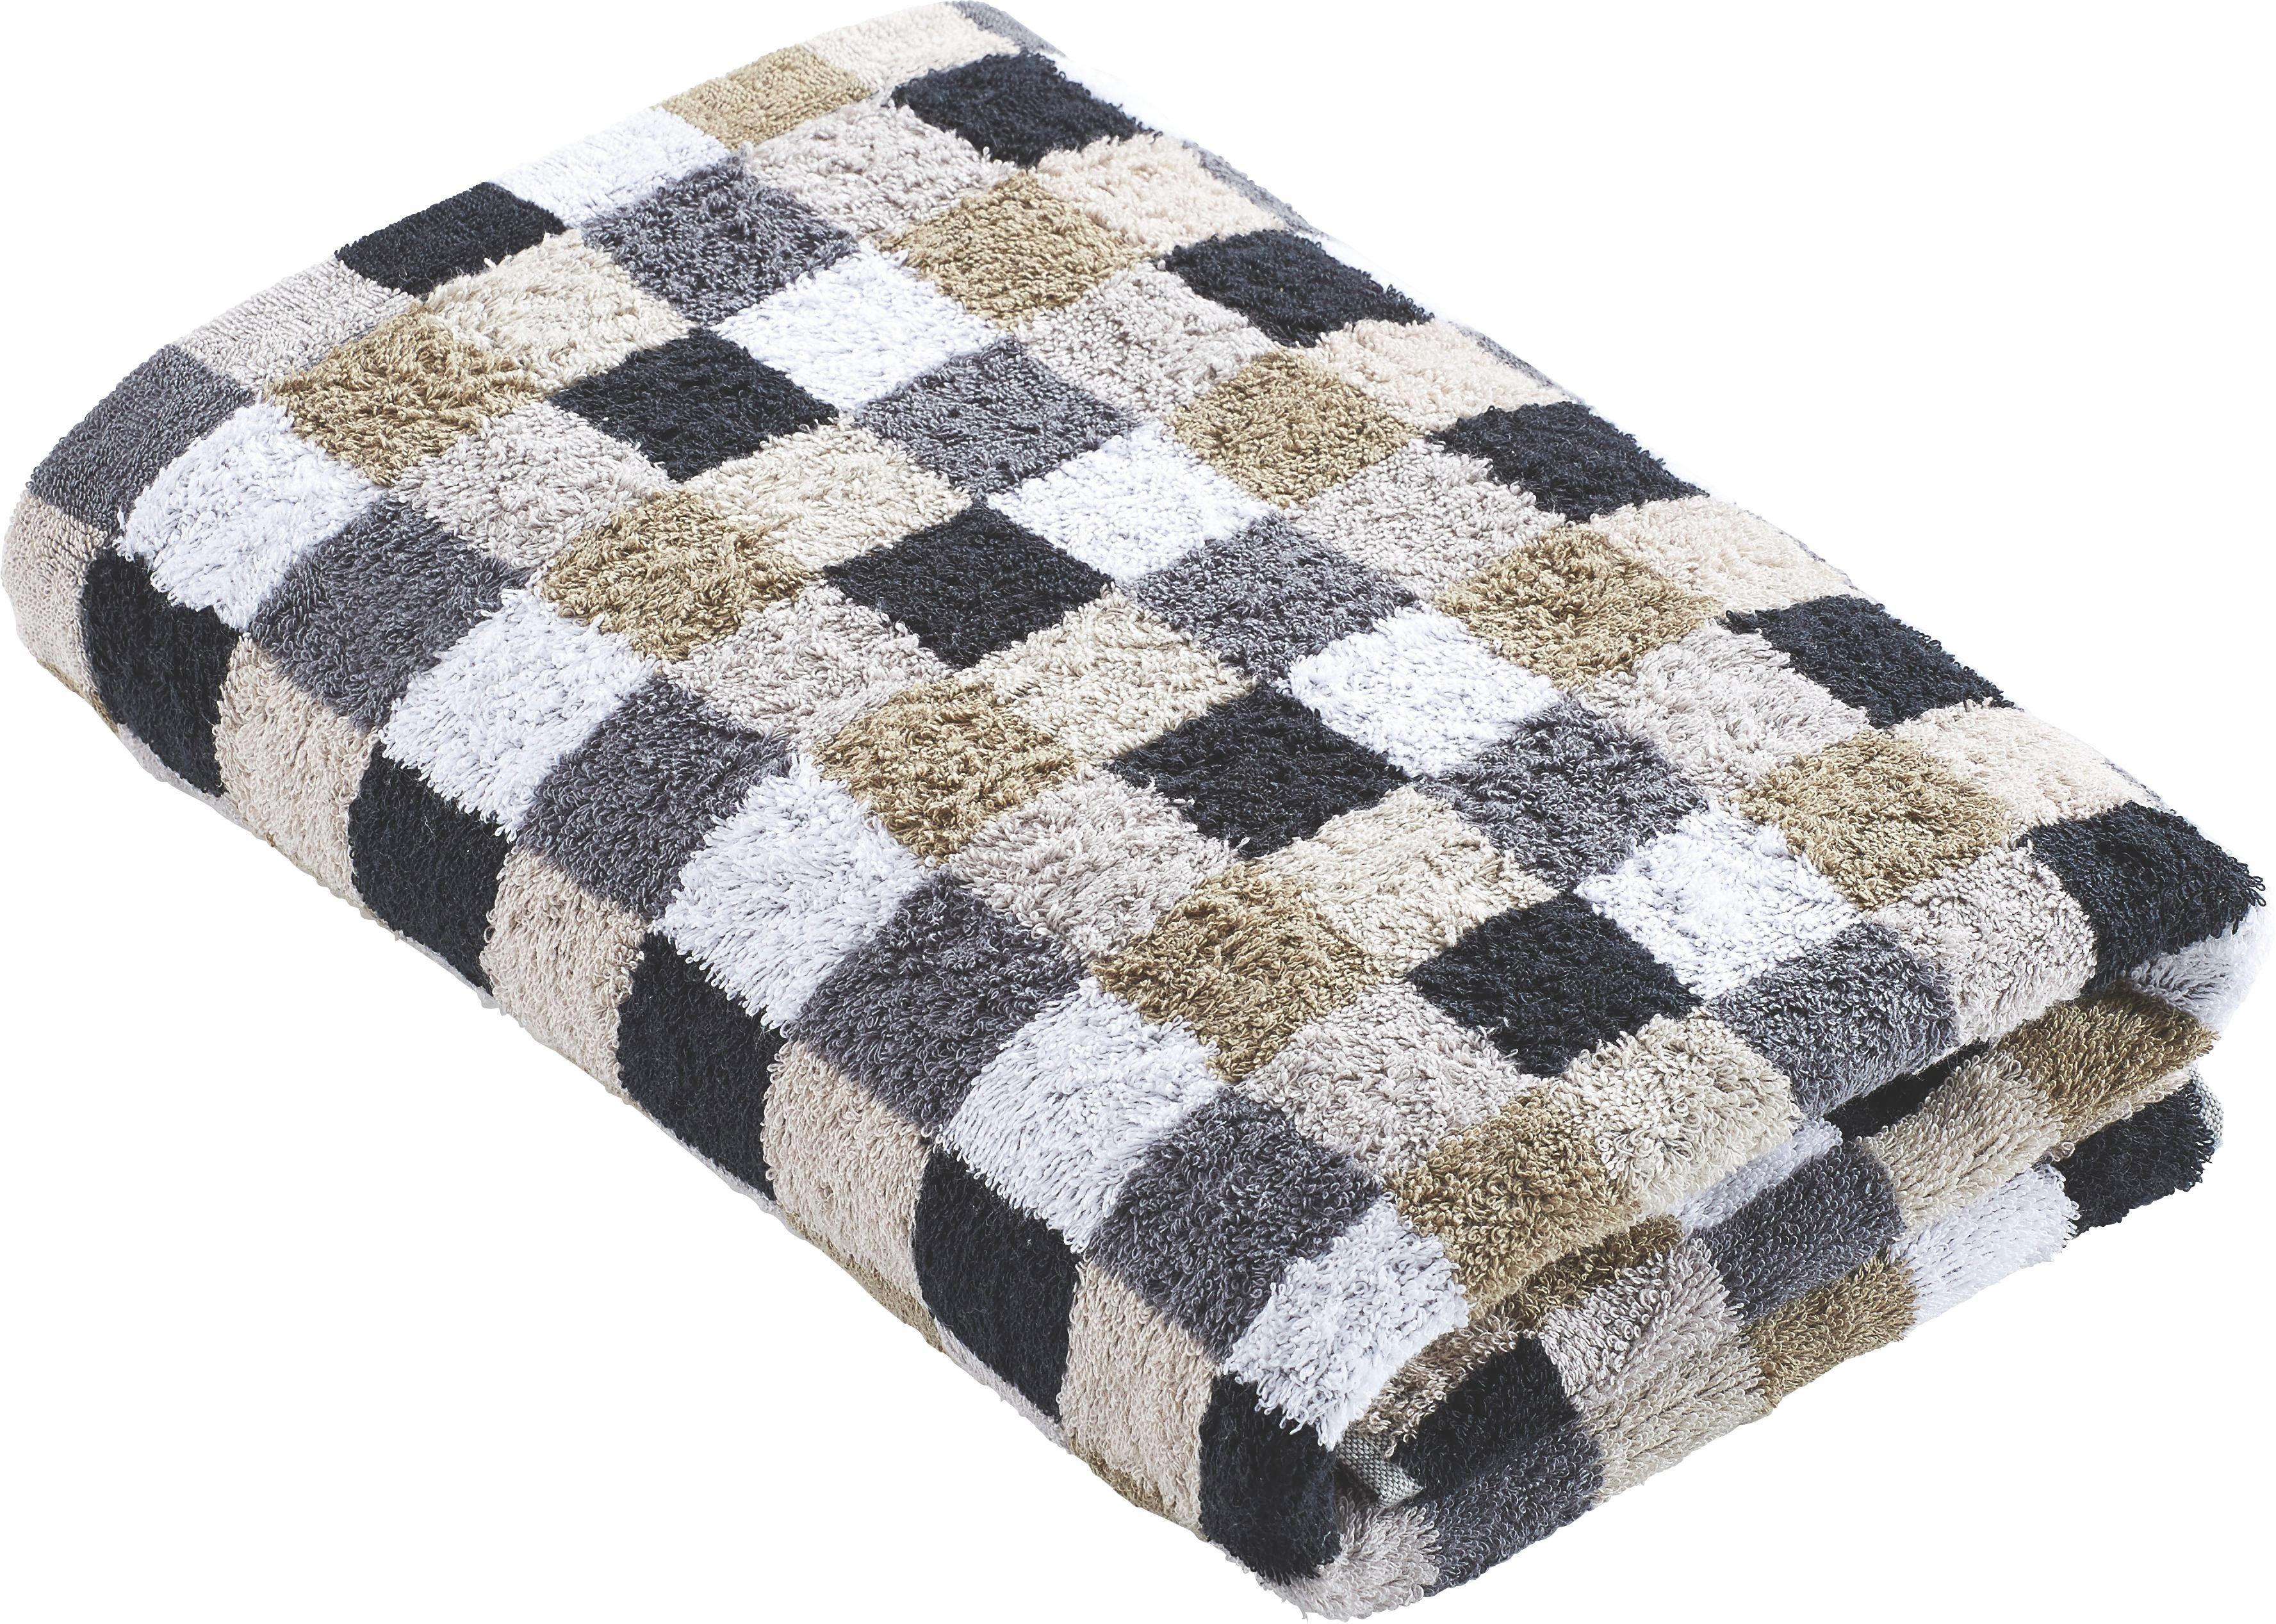 DUSCHTUCH 70/140 cm - Grau, Basics, Textil (70/140cm) - CAWOE